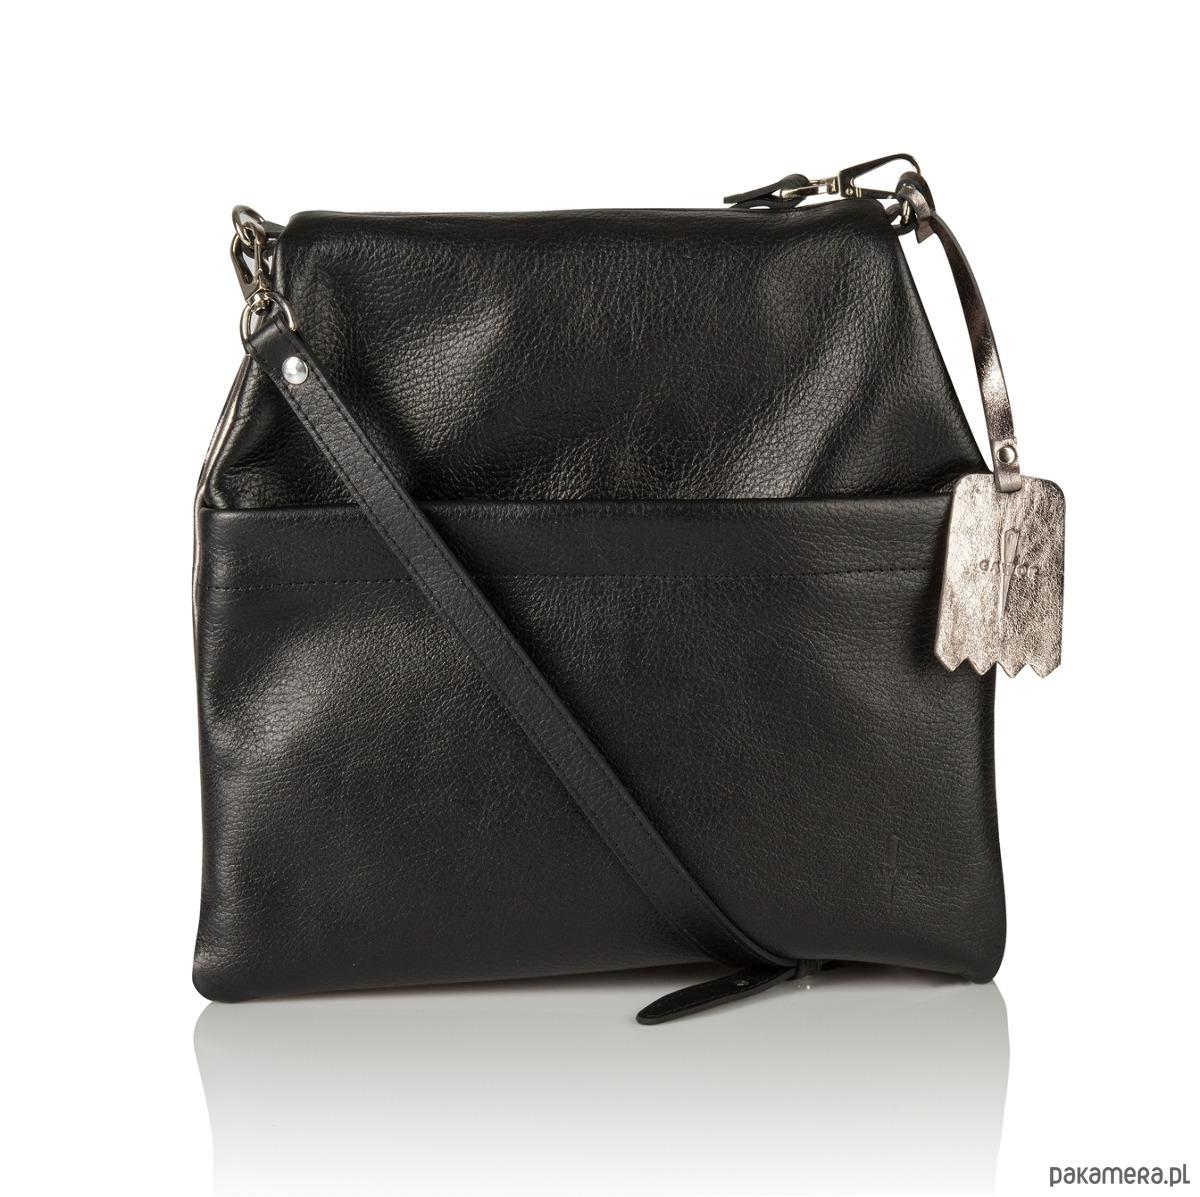 6b07cc4e131fd torby na ramię - damskie-Skórzana dwustronna torebka listonoszka czarna